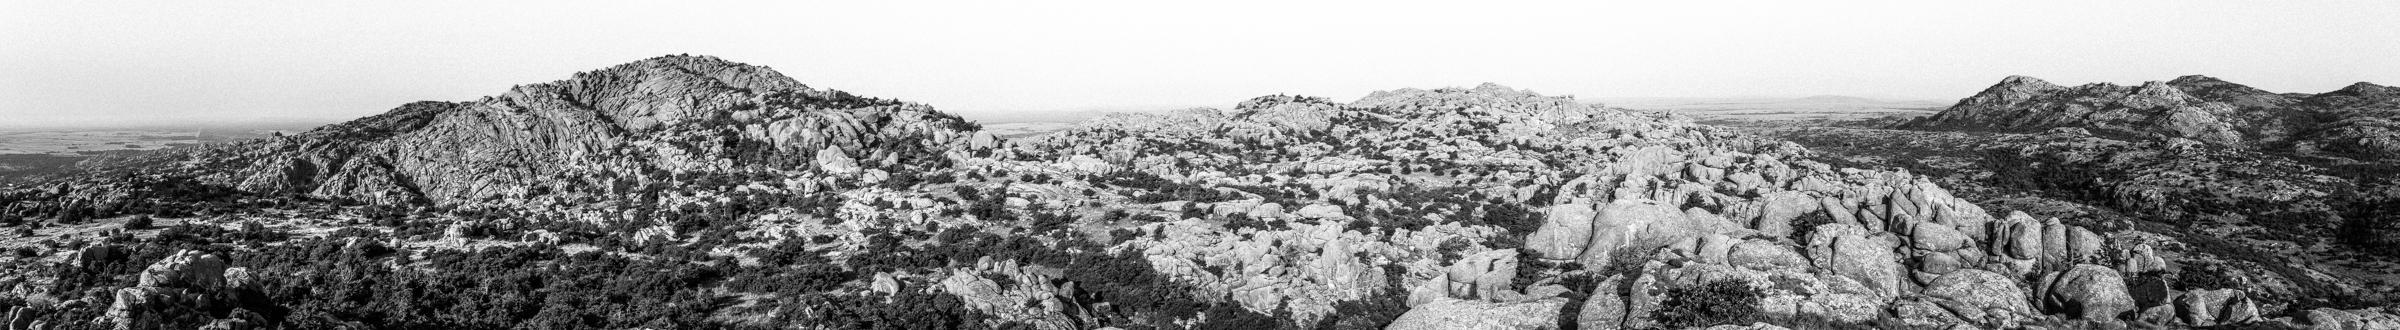 2017-08-05 Glass Mountain Peak B (4 of 20).jpg